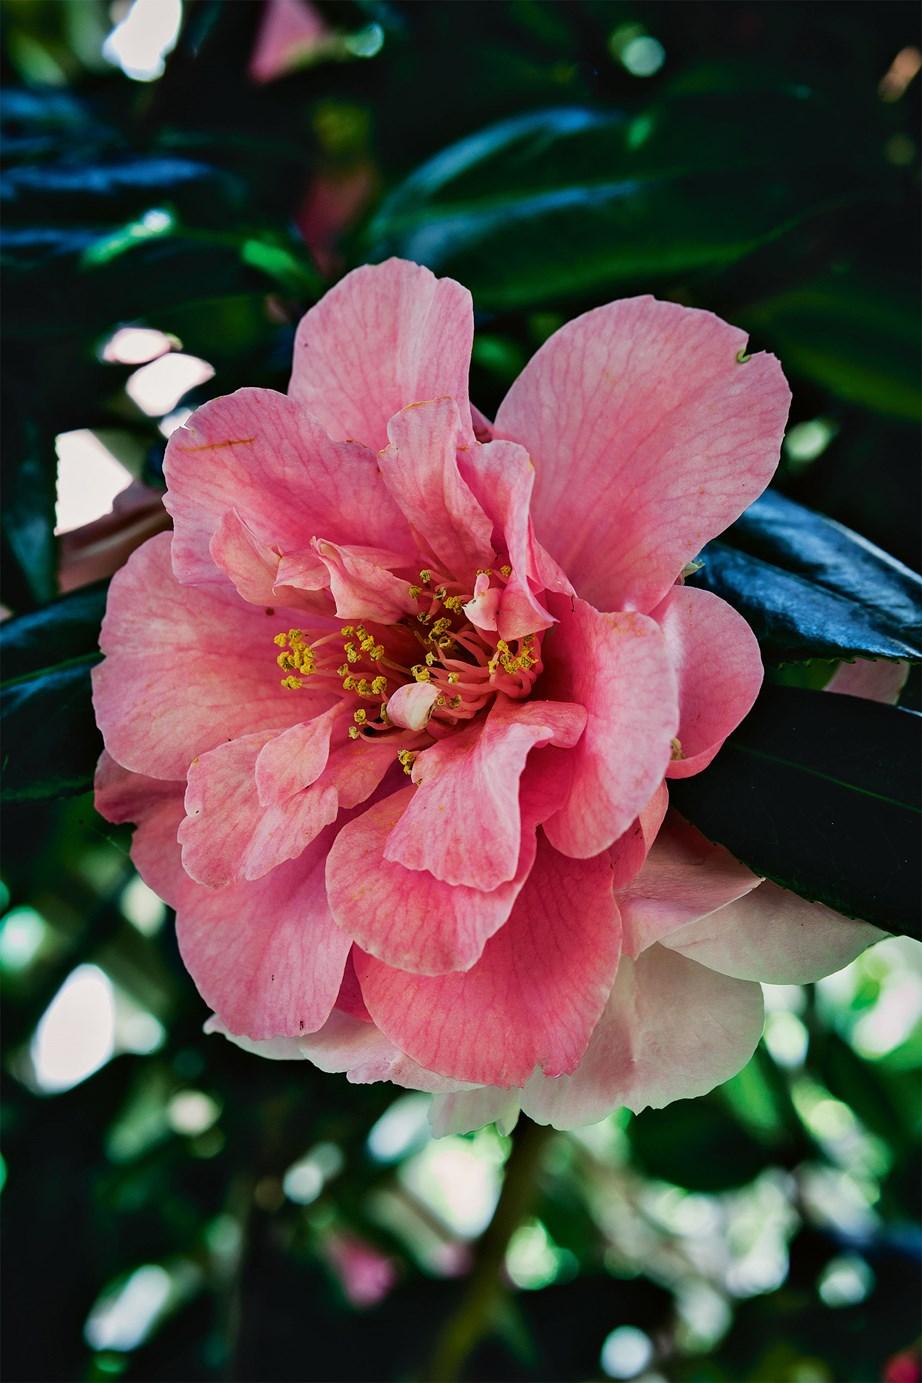 The pink japonica camellia 'Appleblossom'.